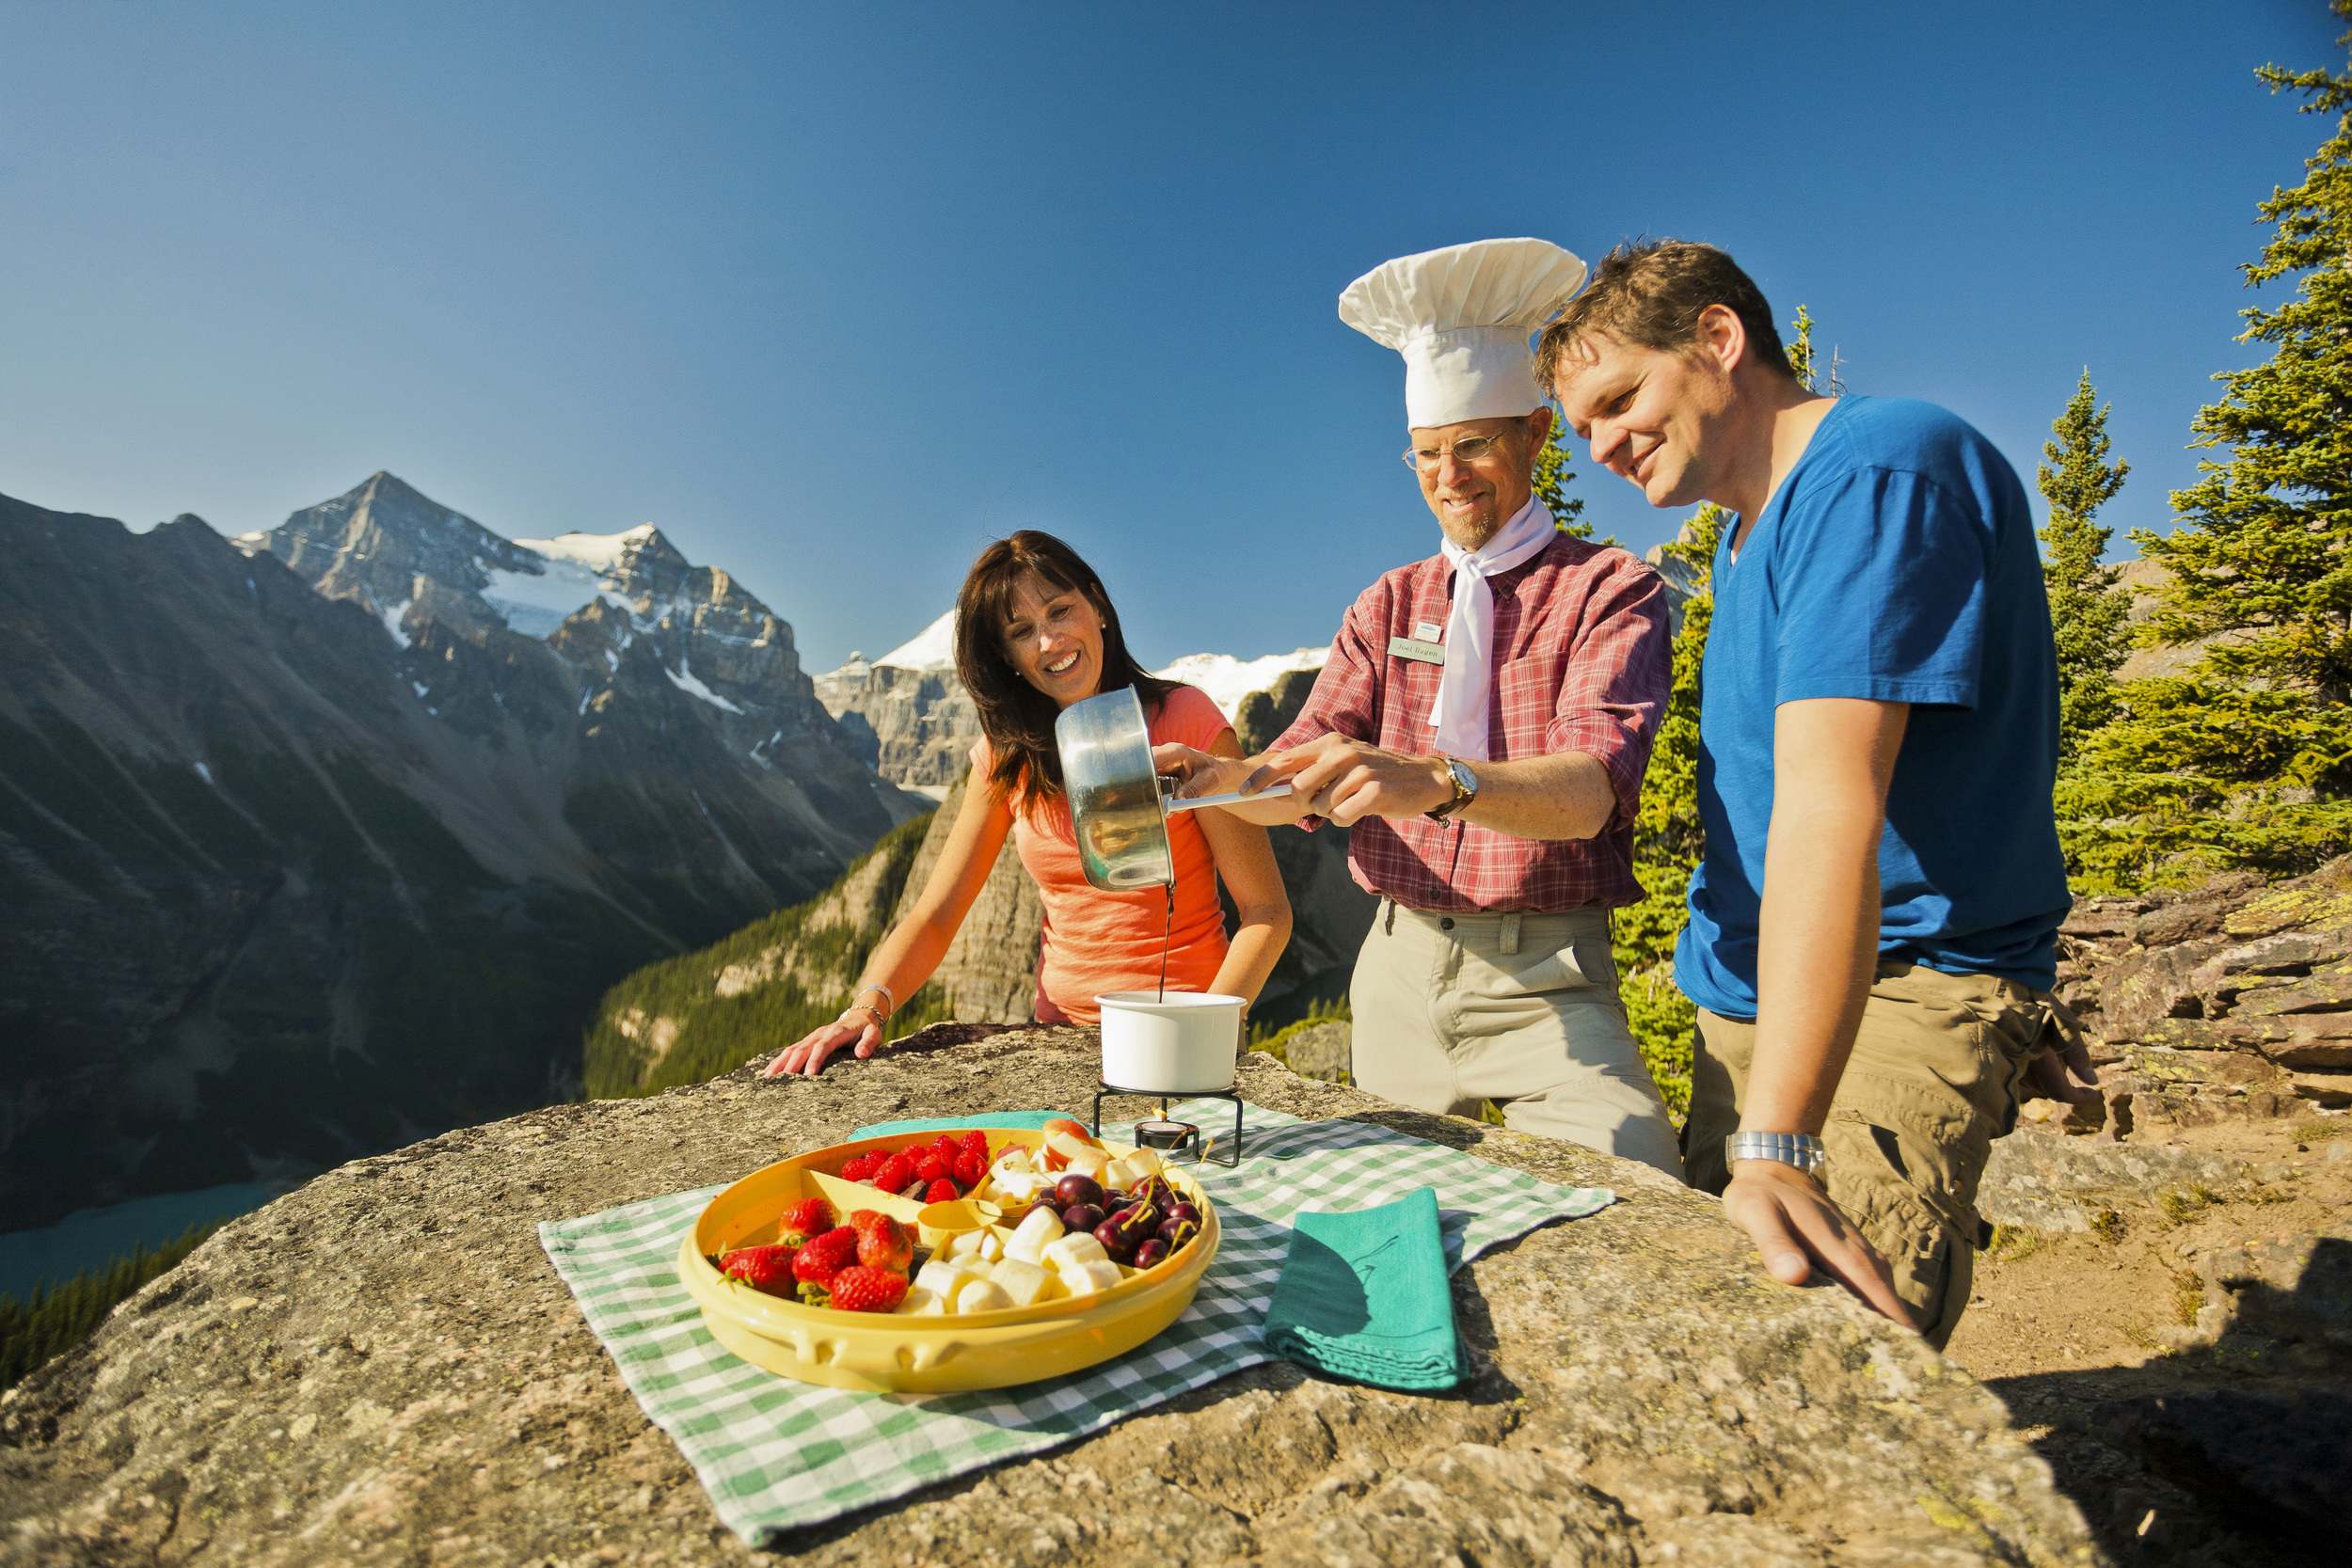 Photo Credit: Banff Lake Louise Tourism / Paul Zizka Photography